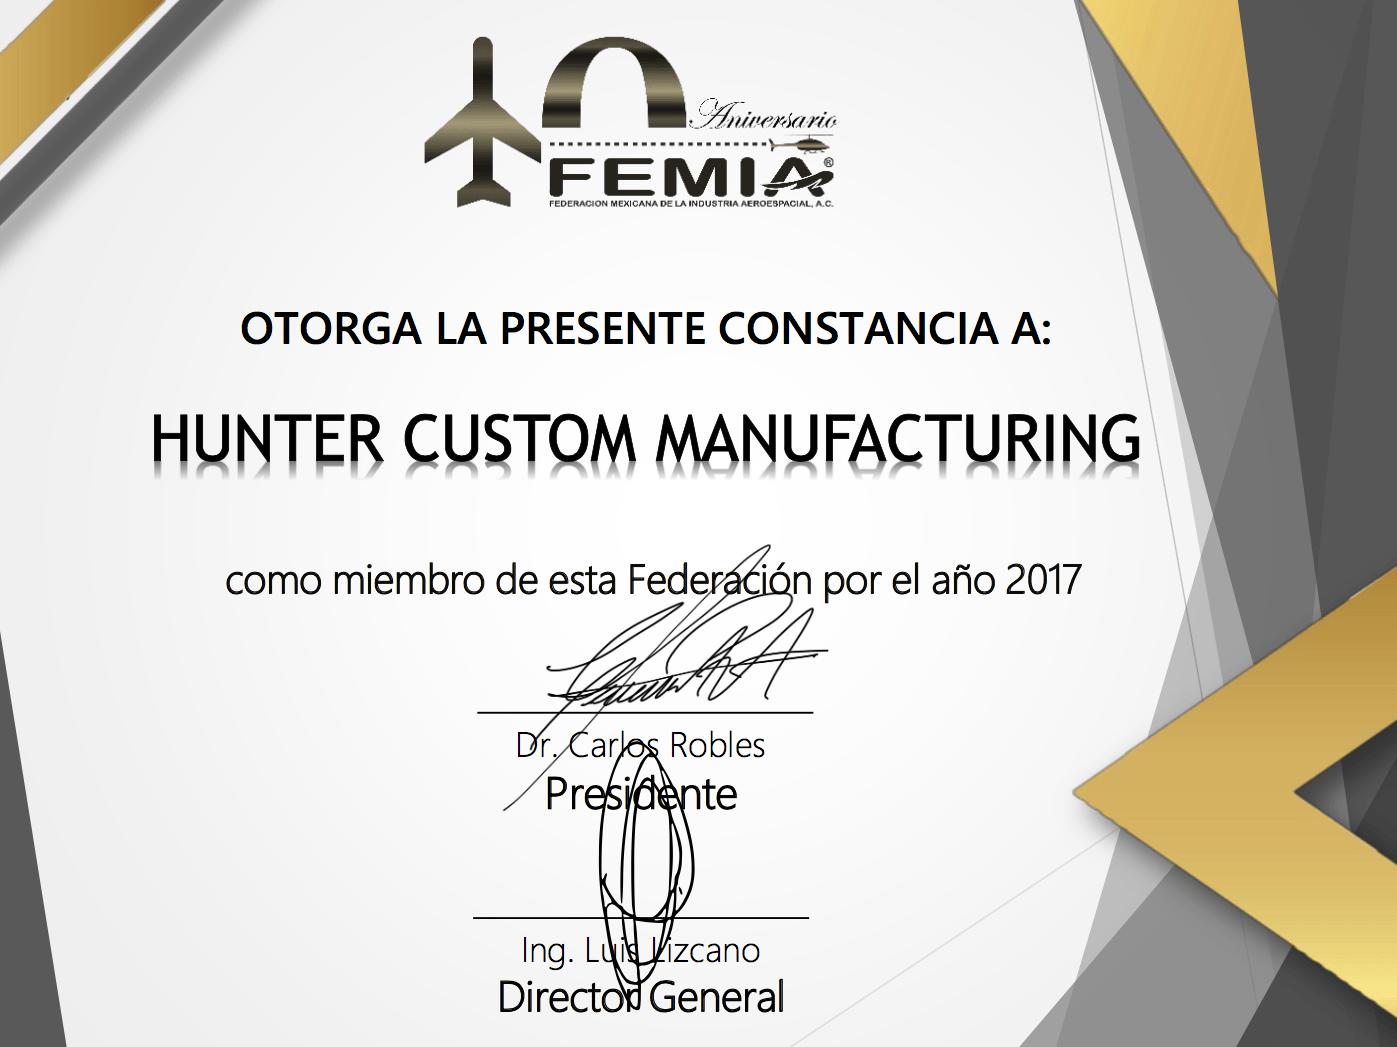 FEMIA Certification